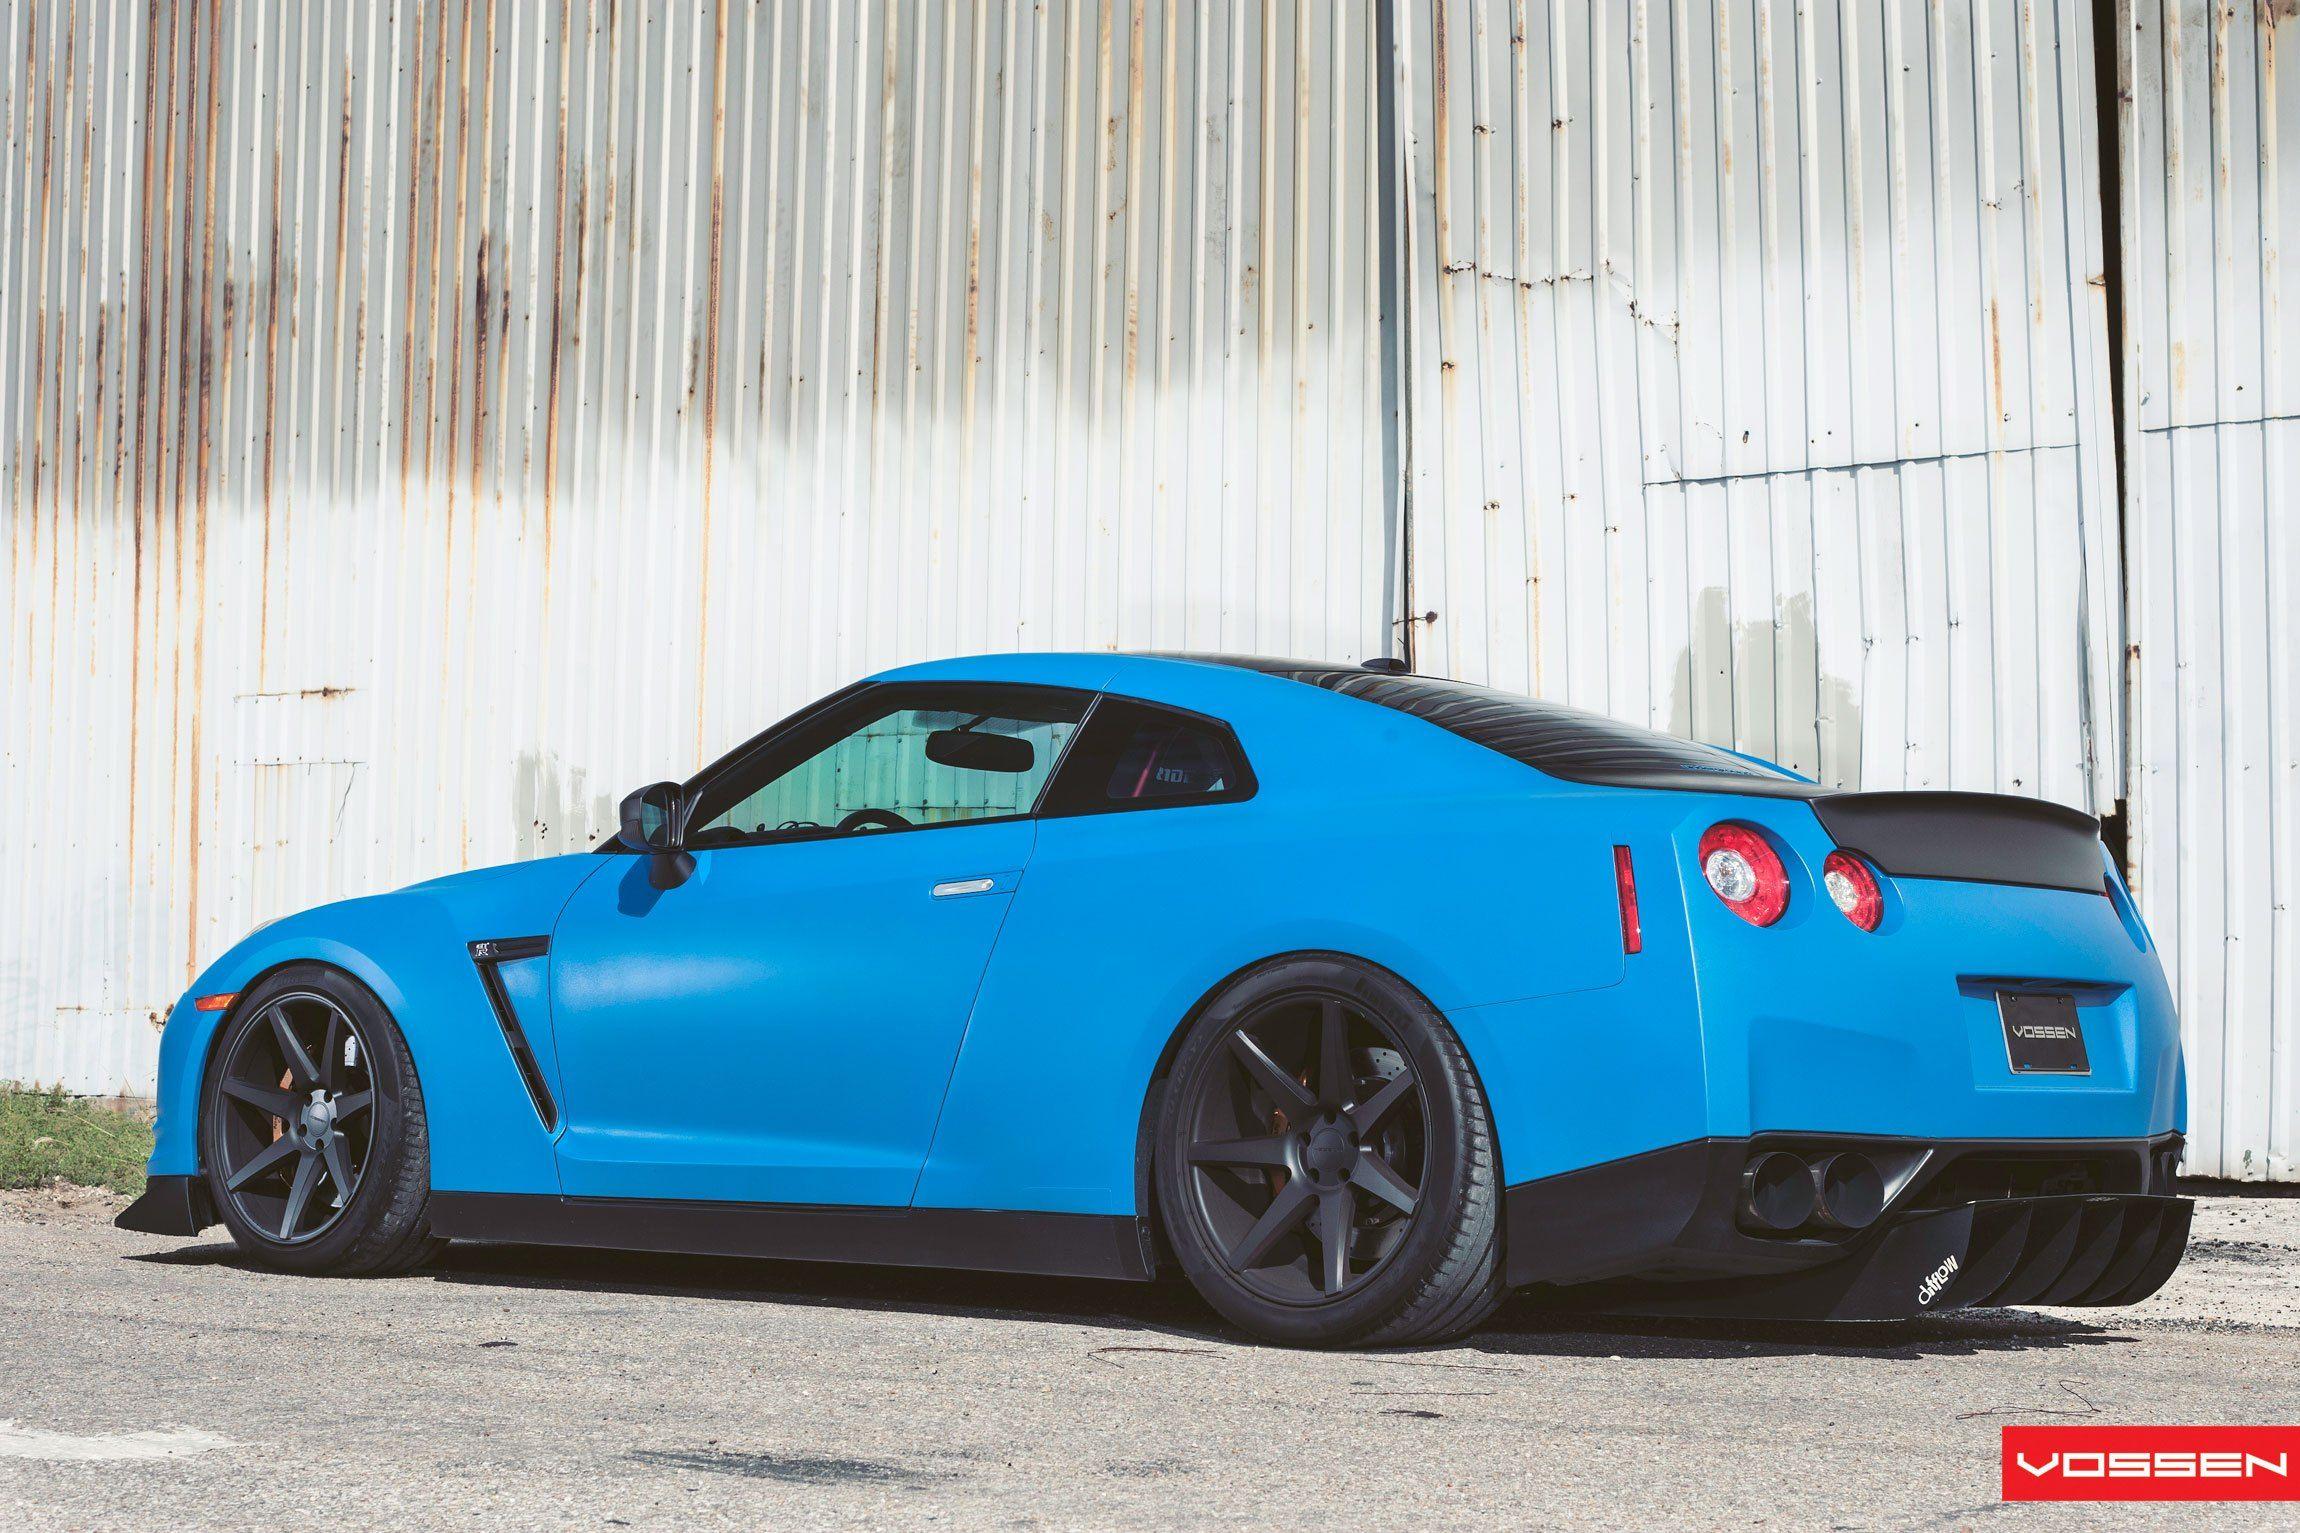 Baby Blue Nissan Gt R Gets A Distinct Look With Custom Goodies Car